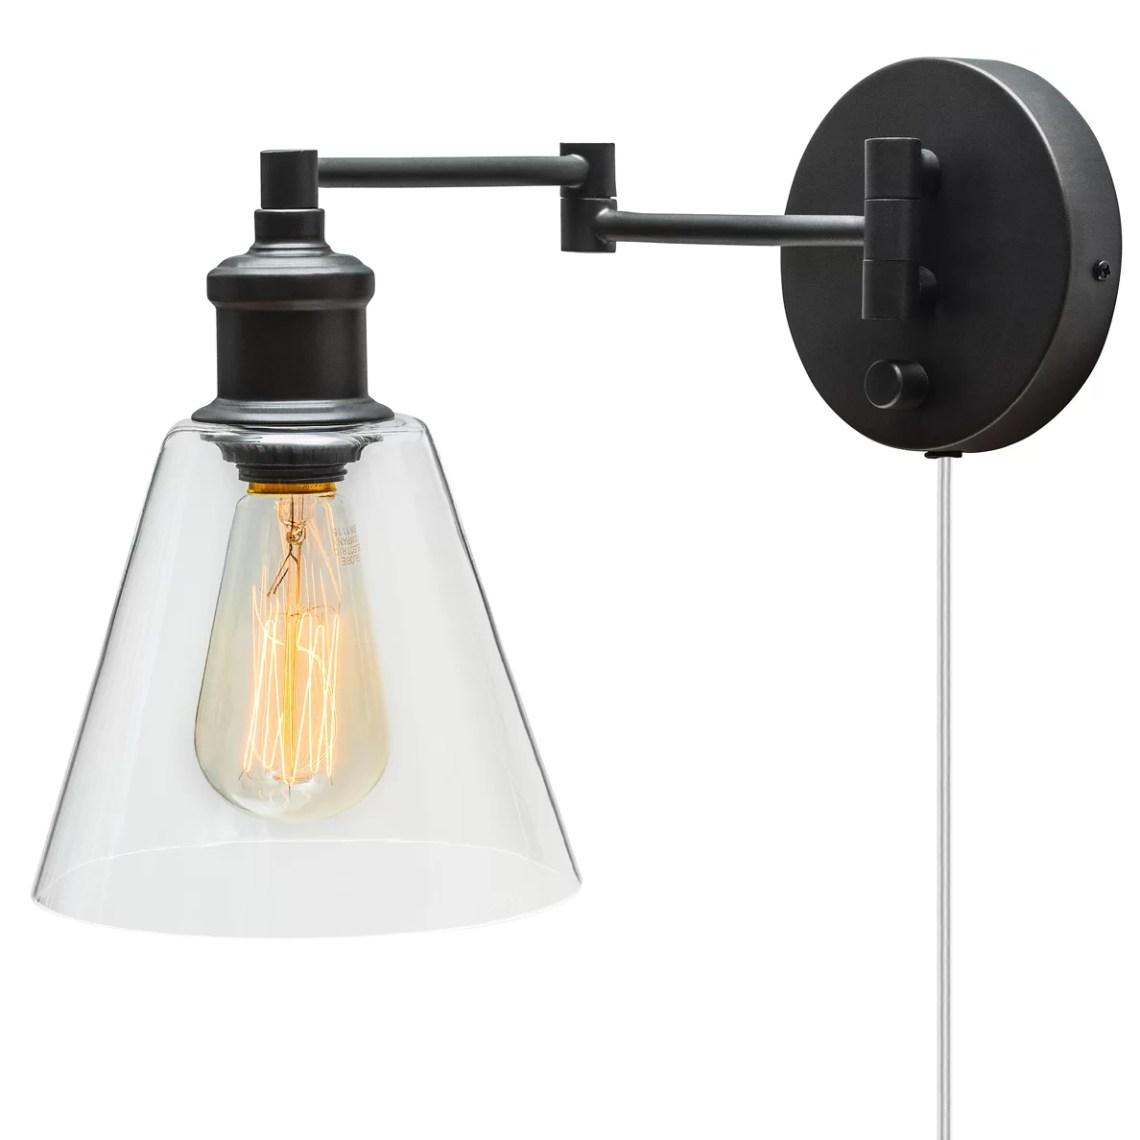 Dainolite Lighting DGUW224 Modern PlugIn Wall Sconce ...